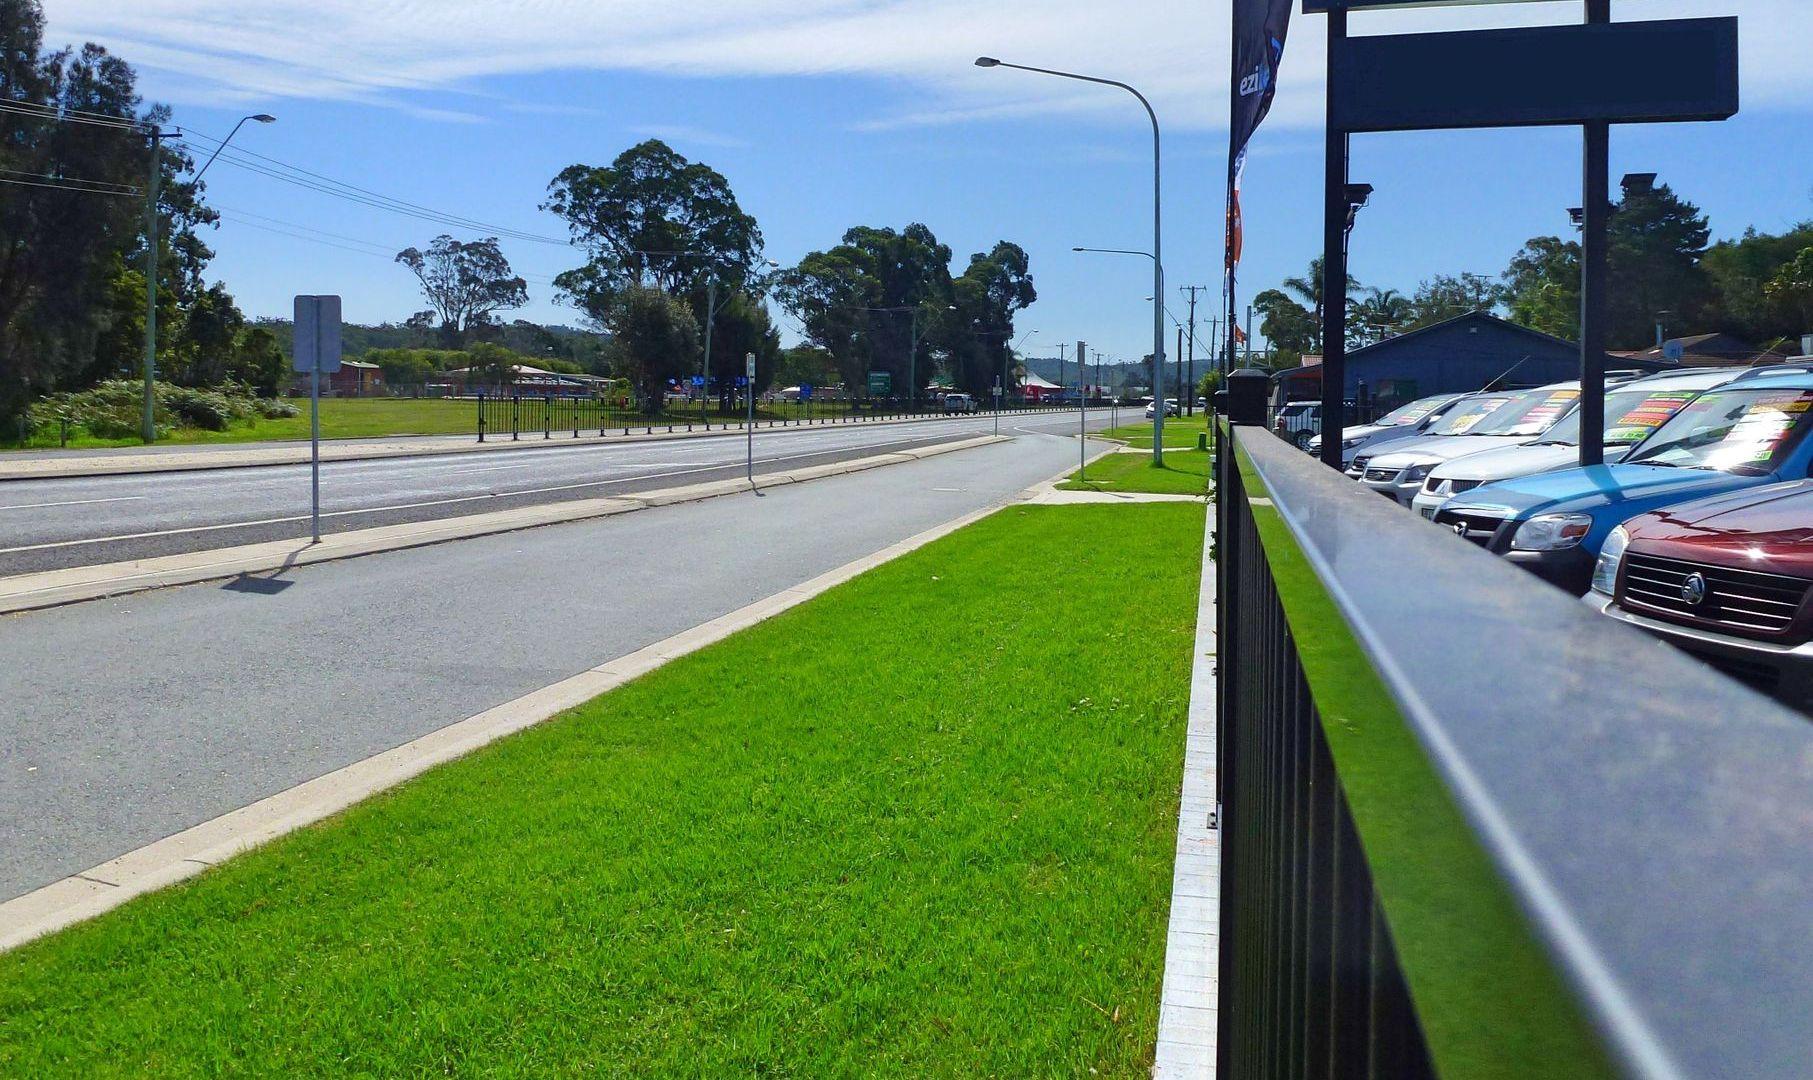 13-15 Vesper Street, Batemans Bay NSW 2536, Image 1